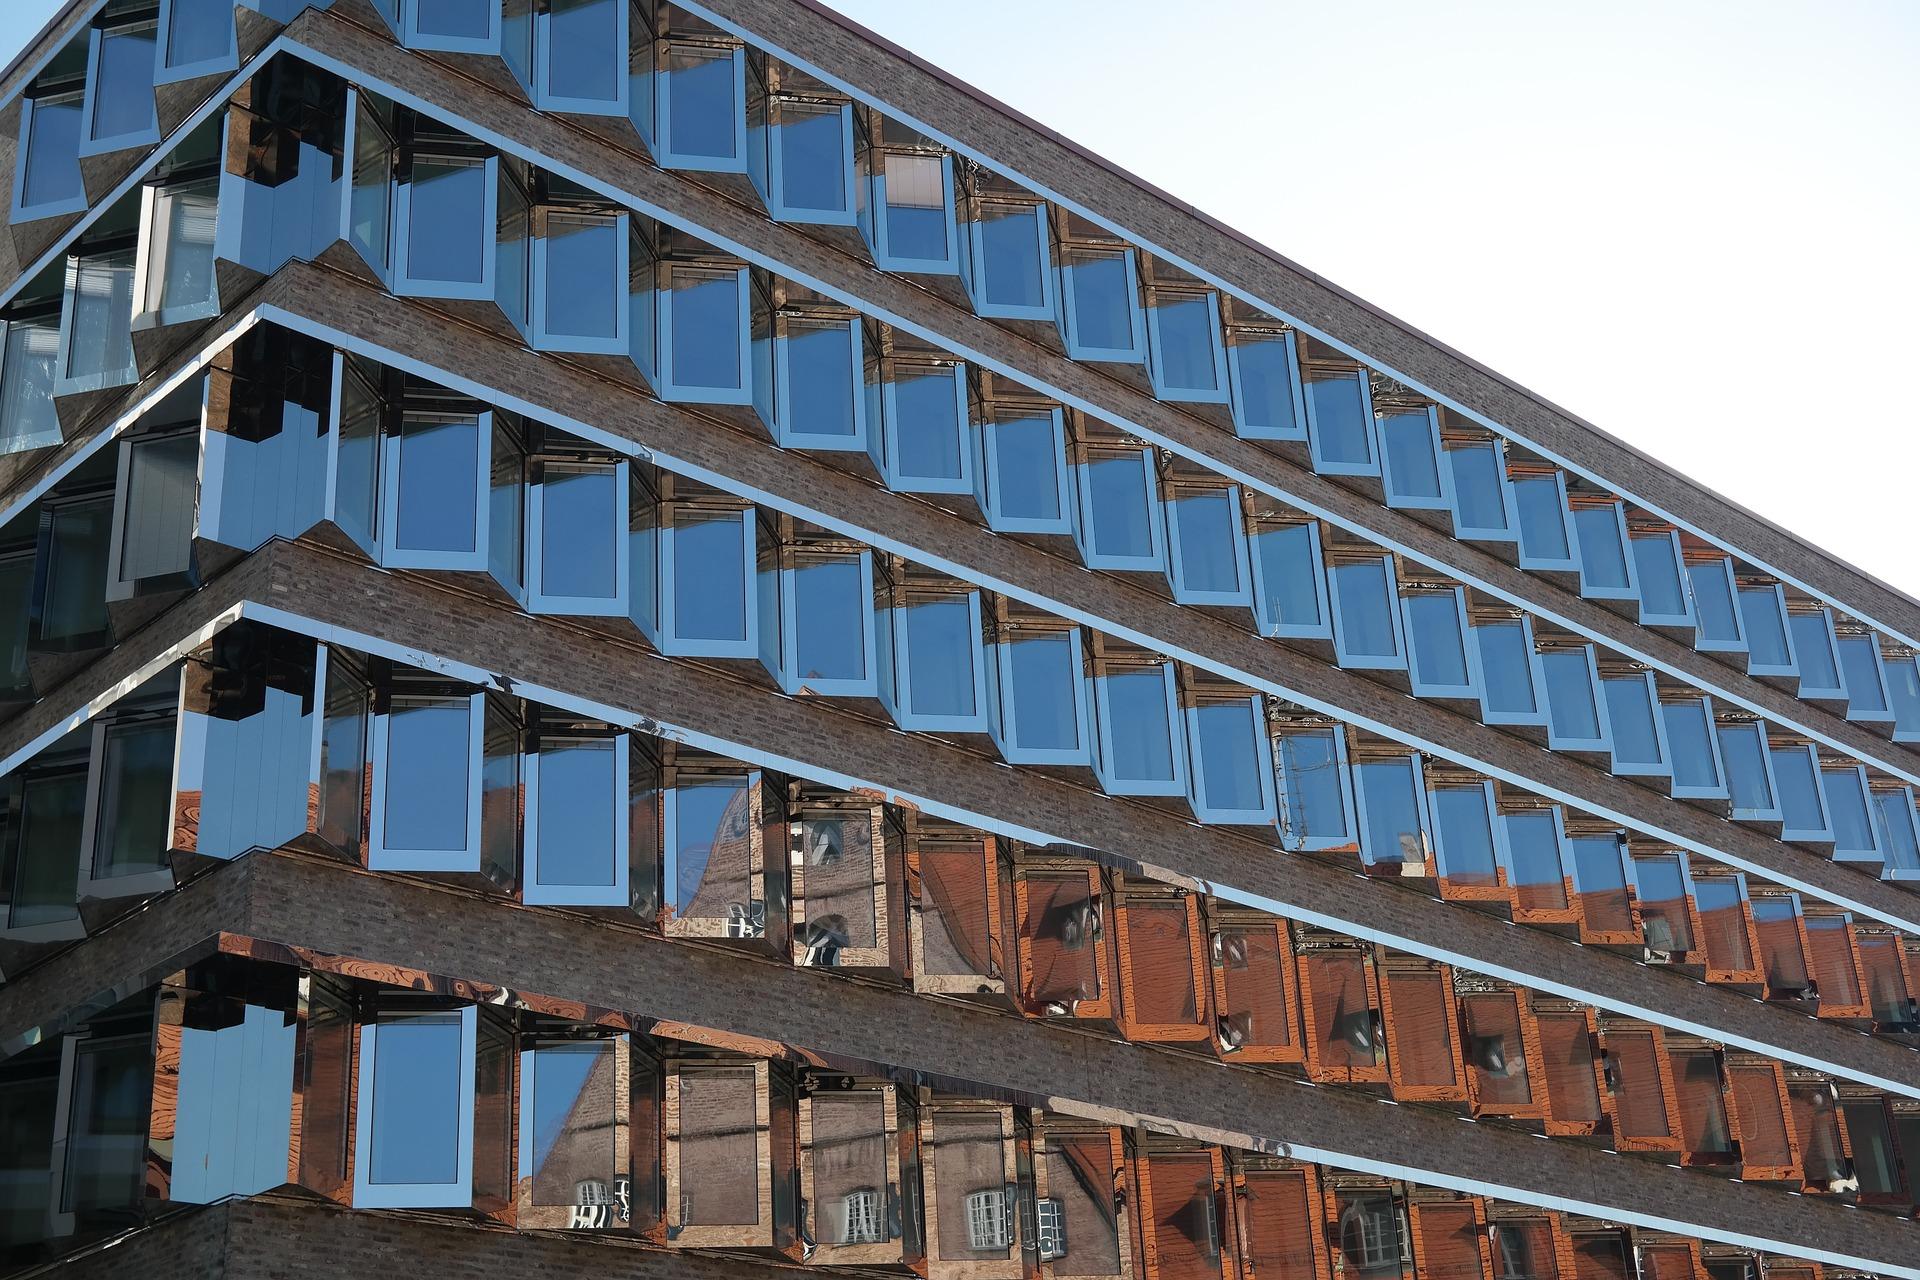 Insulated glazing